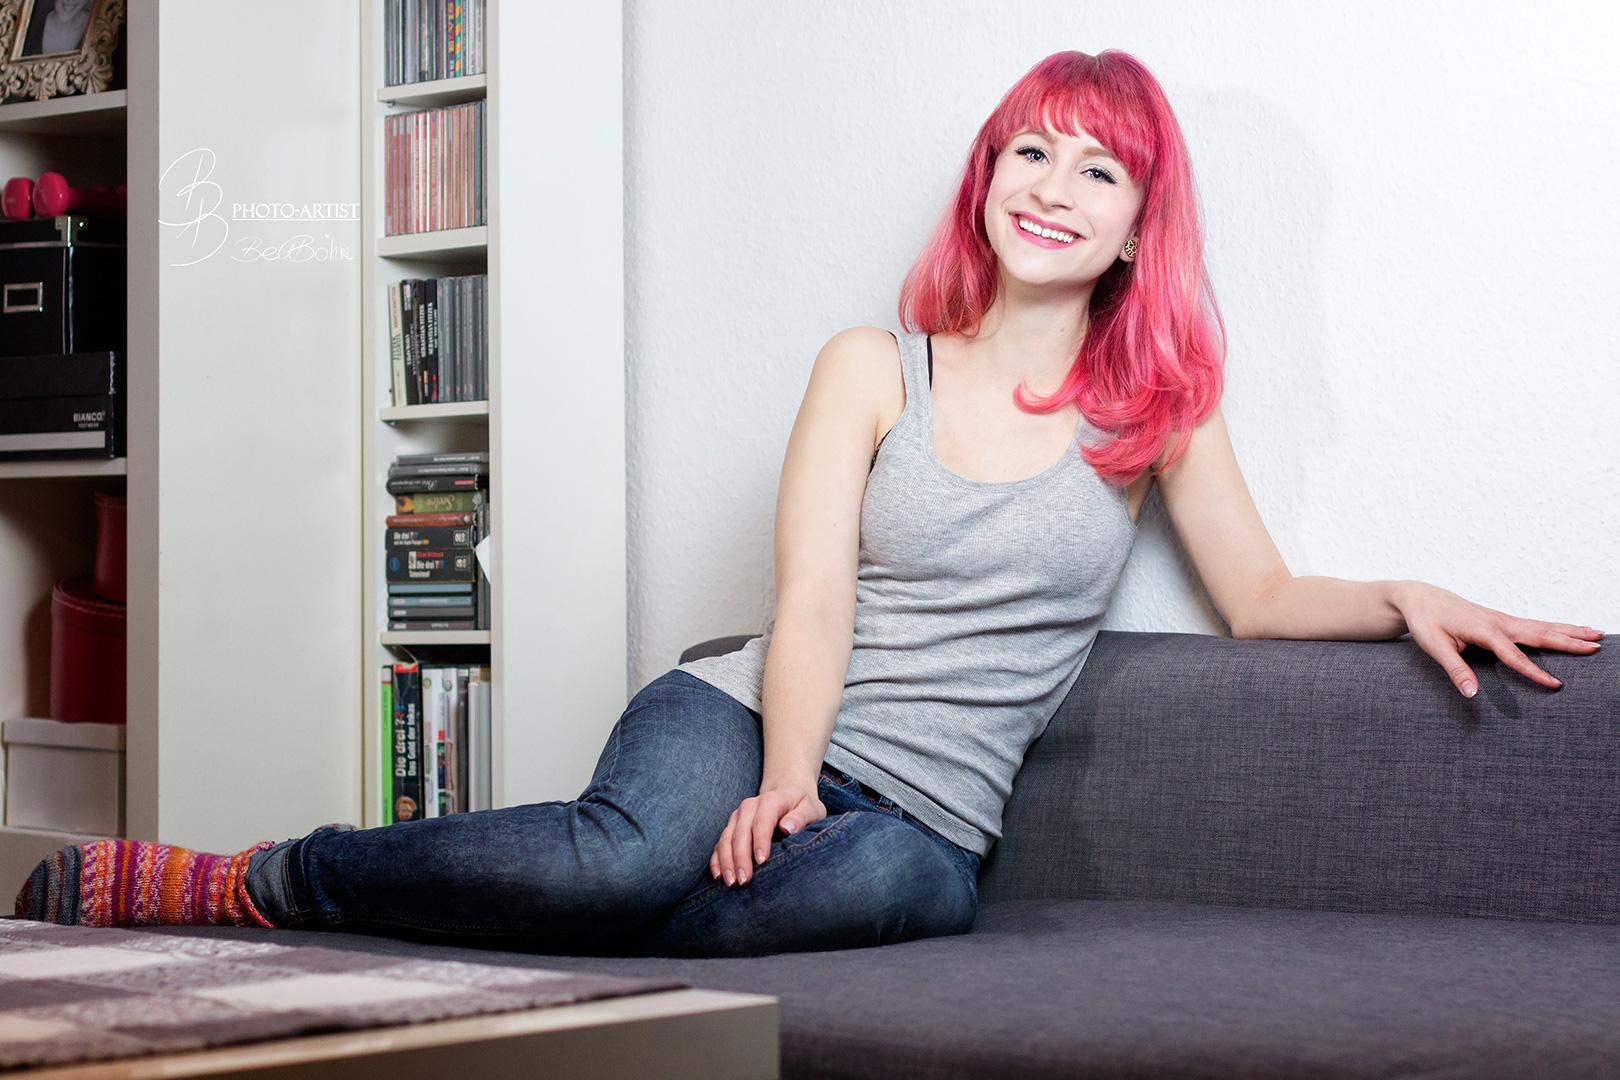 18 Amy auf dem Sofa